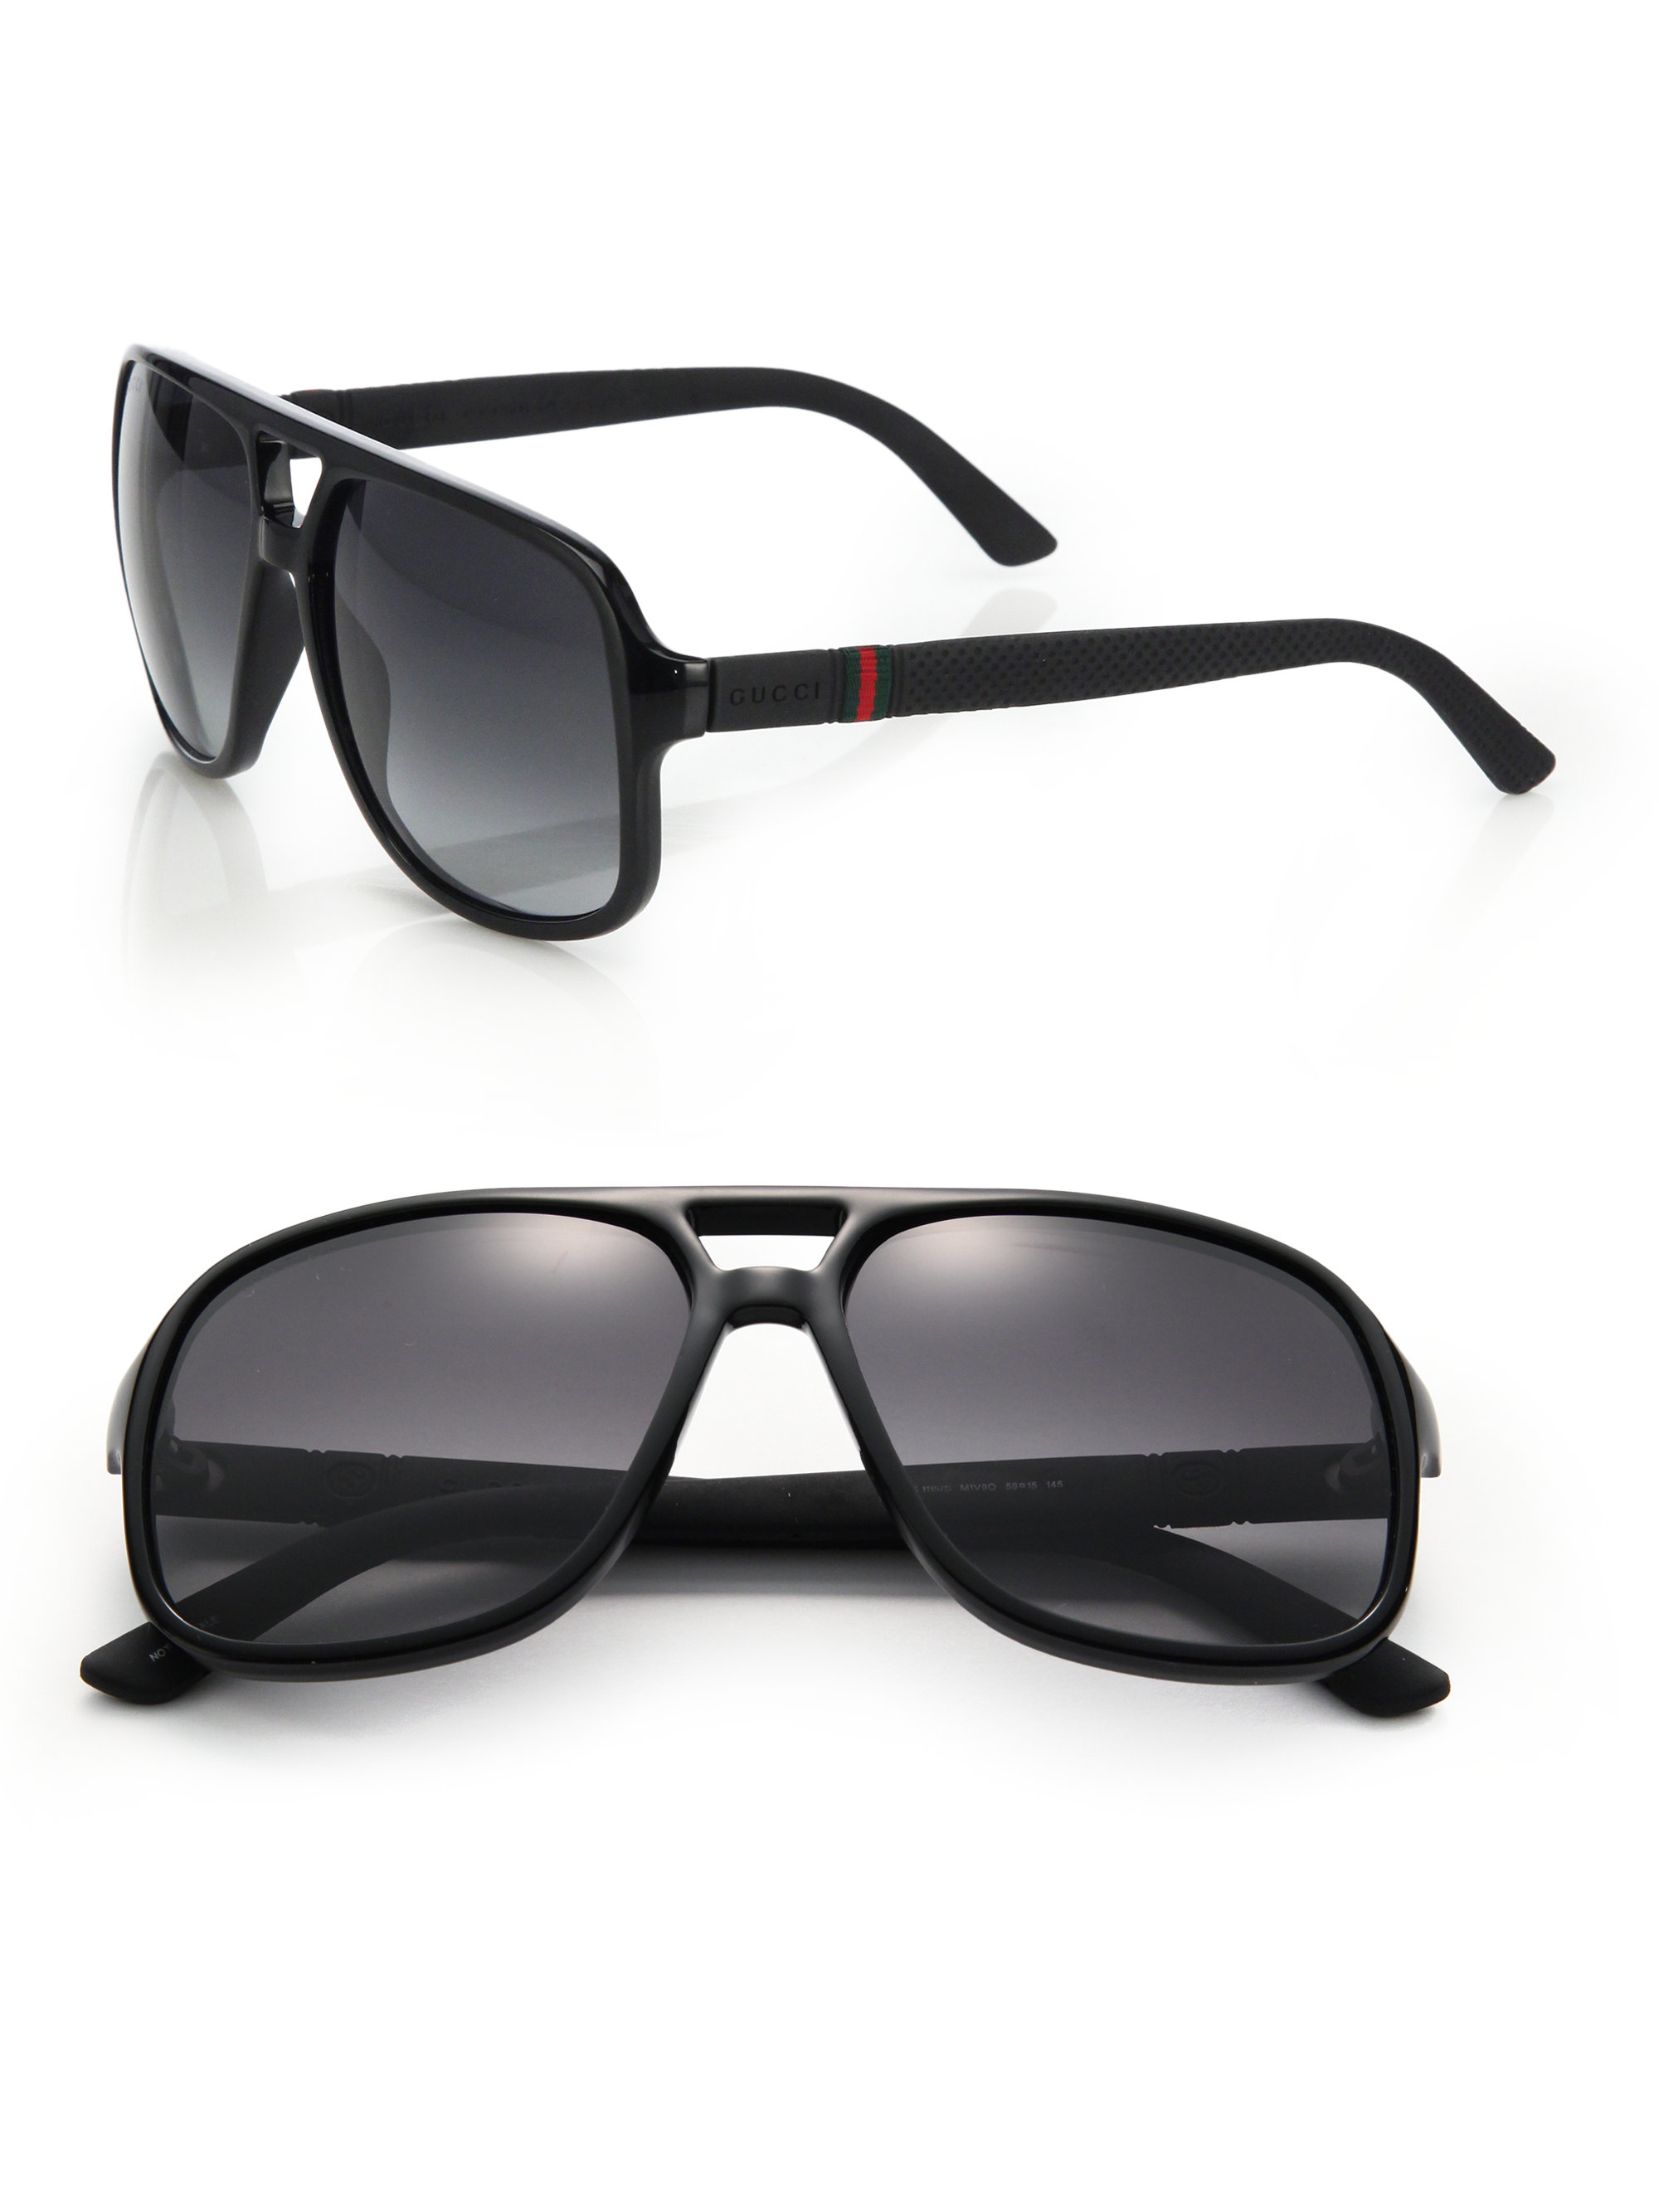 5ecd8bd548 Lyst - Gucci 1115 59mm Mirror Aviator Sunglasses in Black for Men